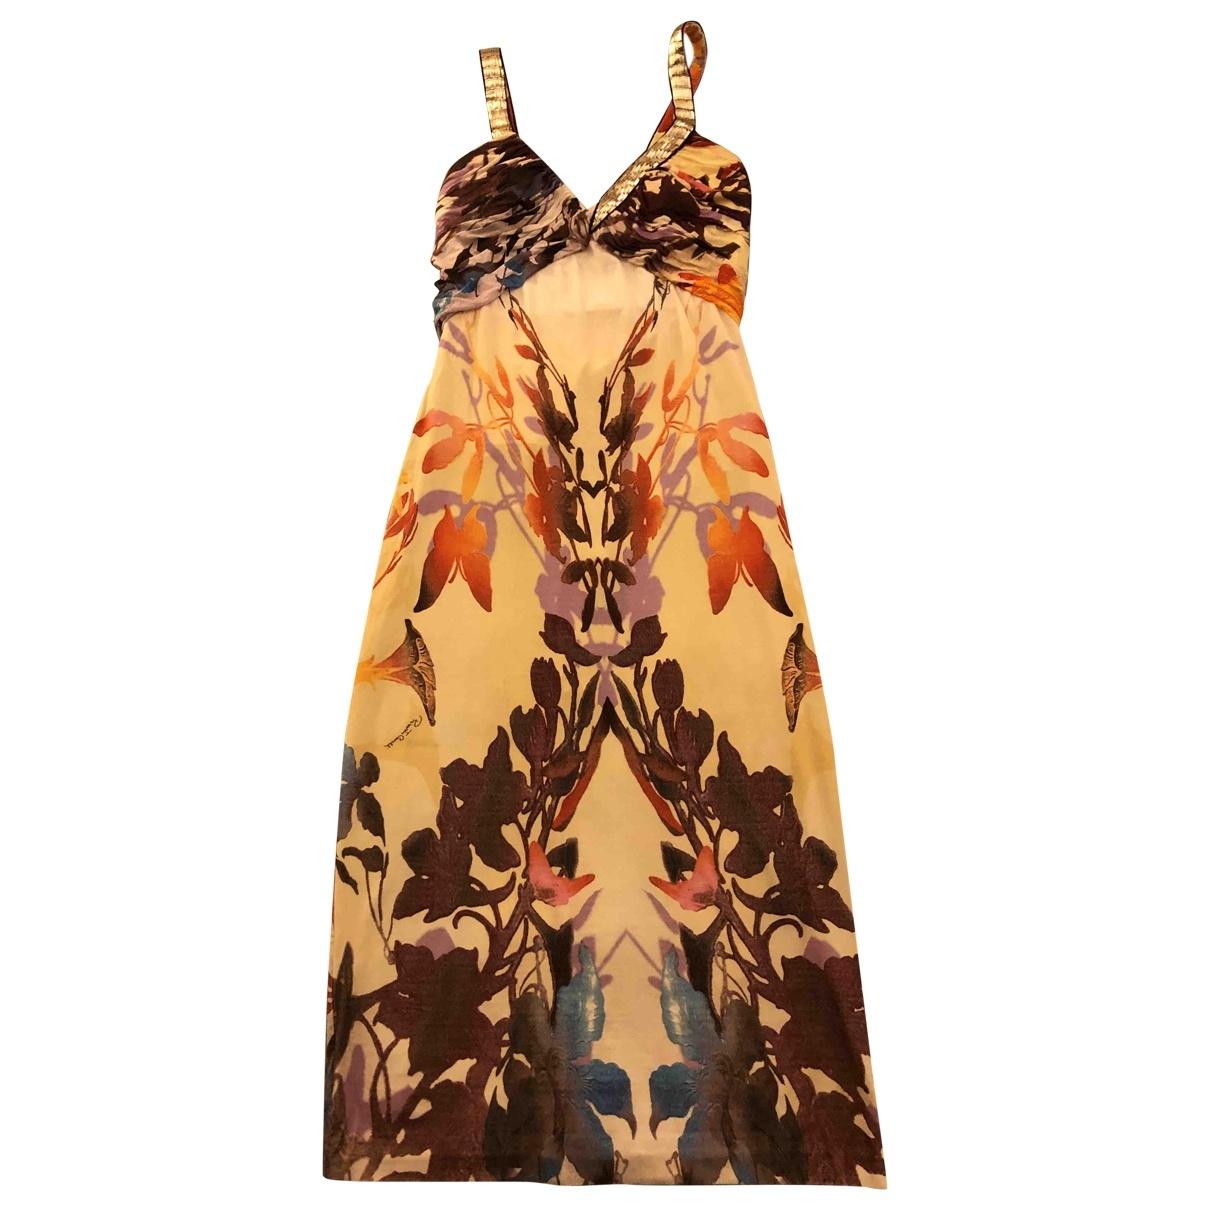 Roberto Cavalli \N Silk dress for Women 38 IT